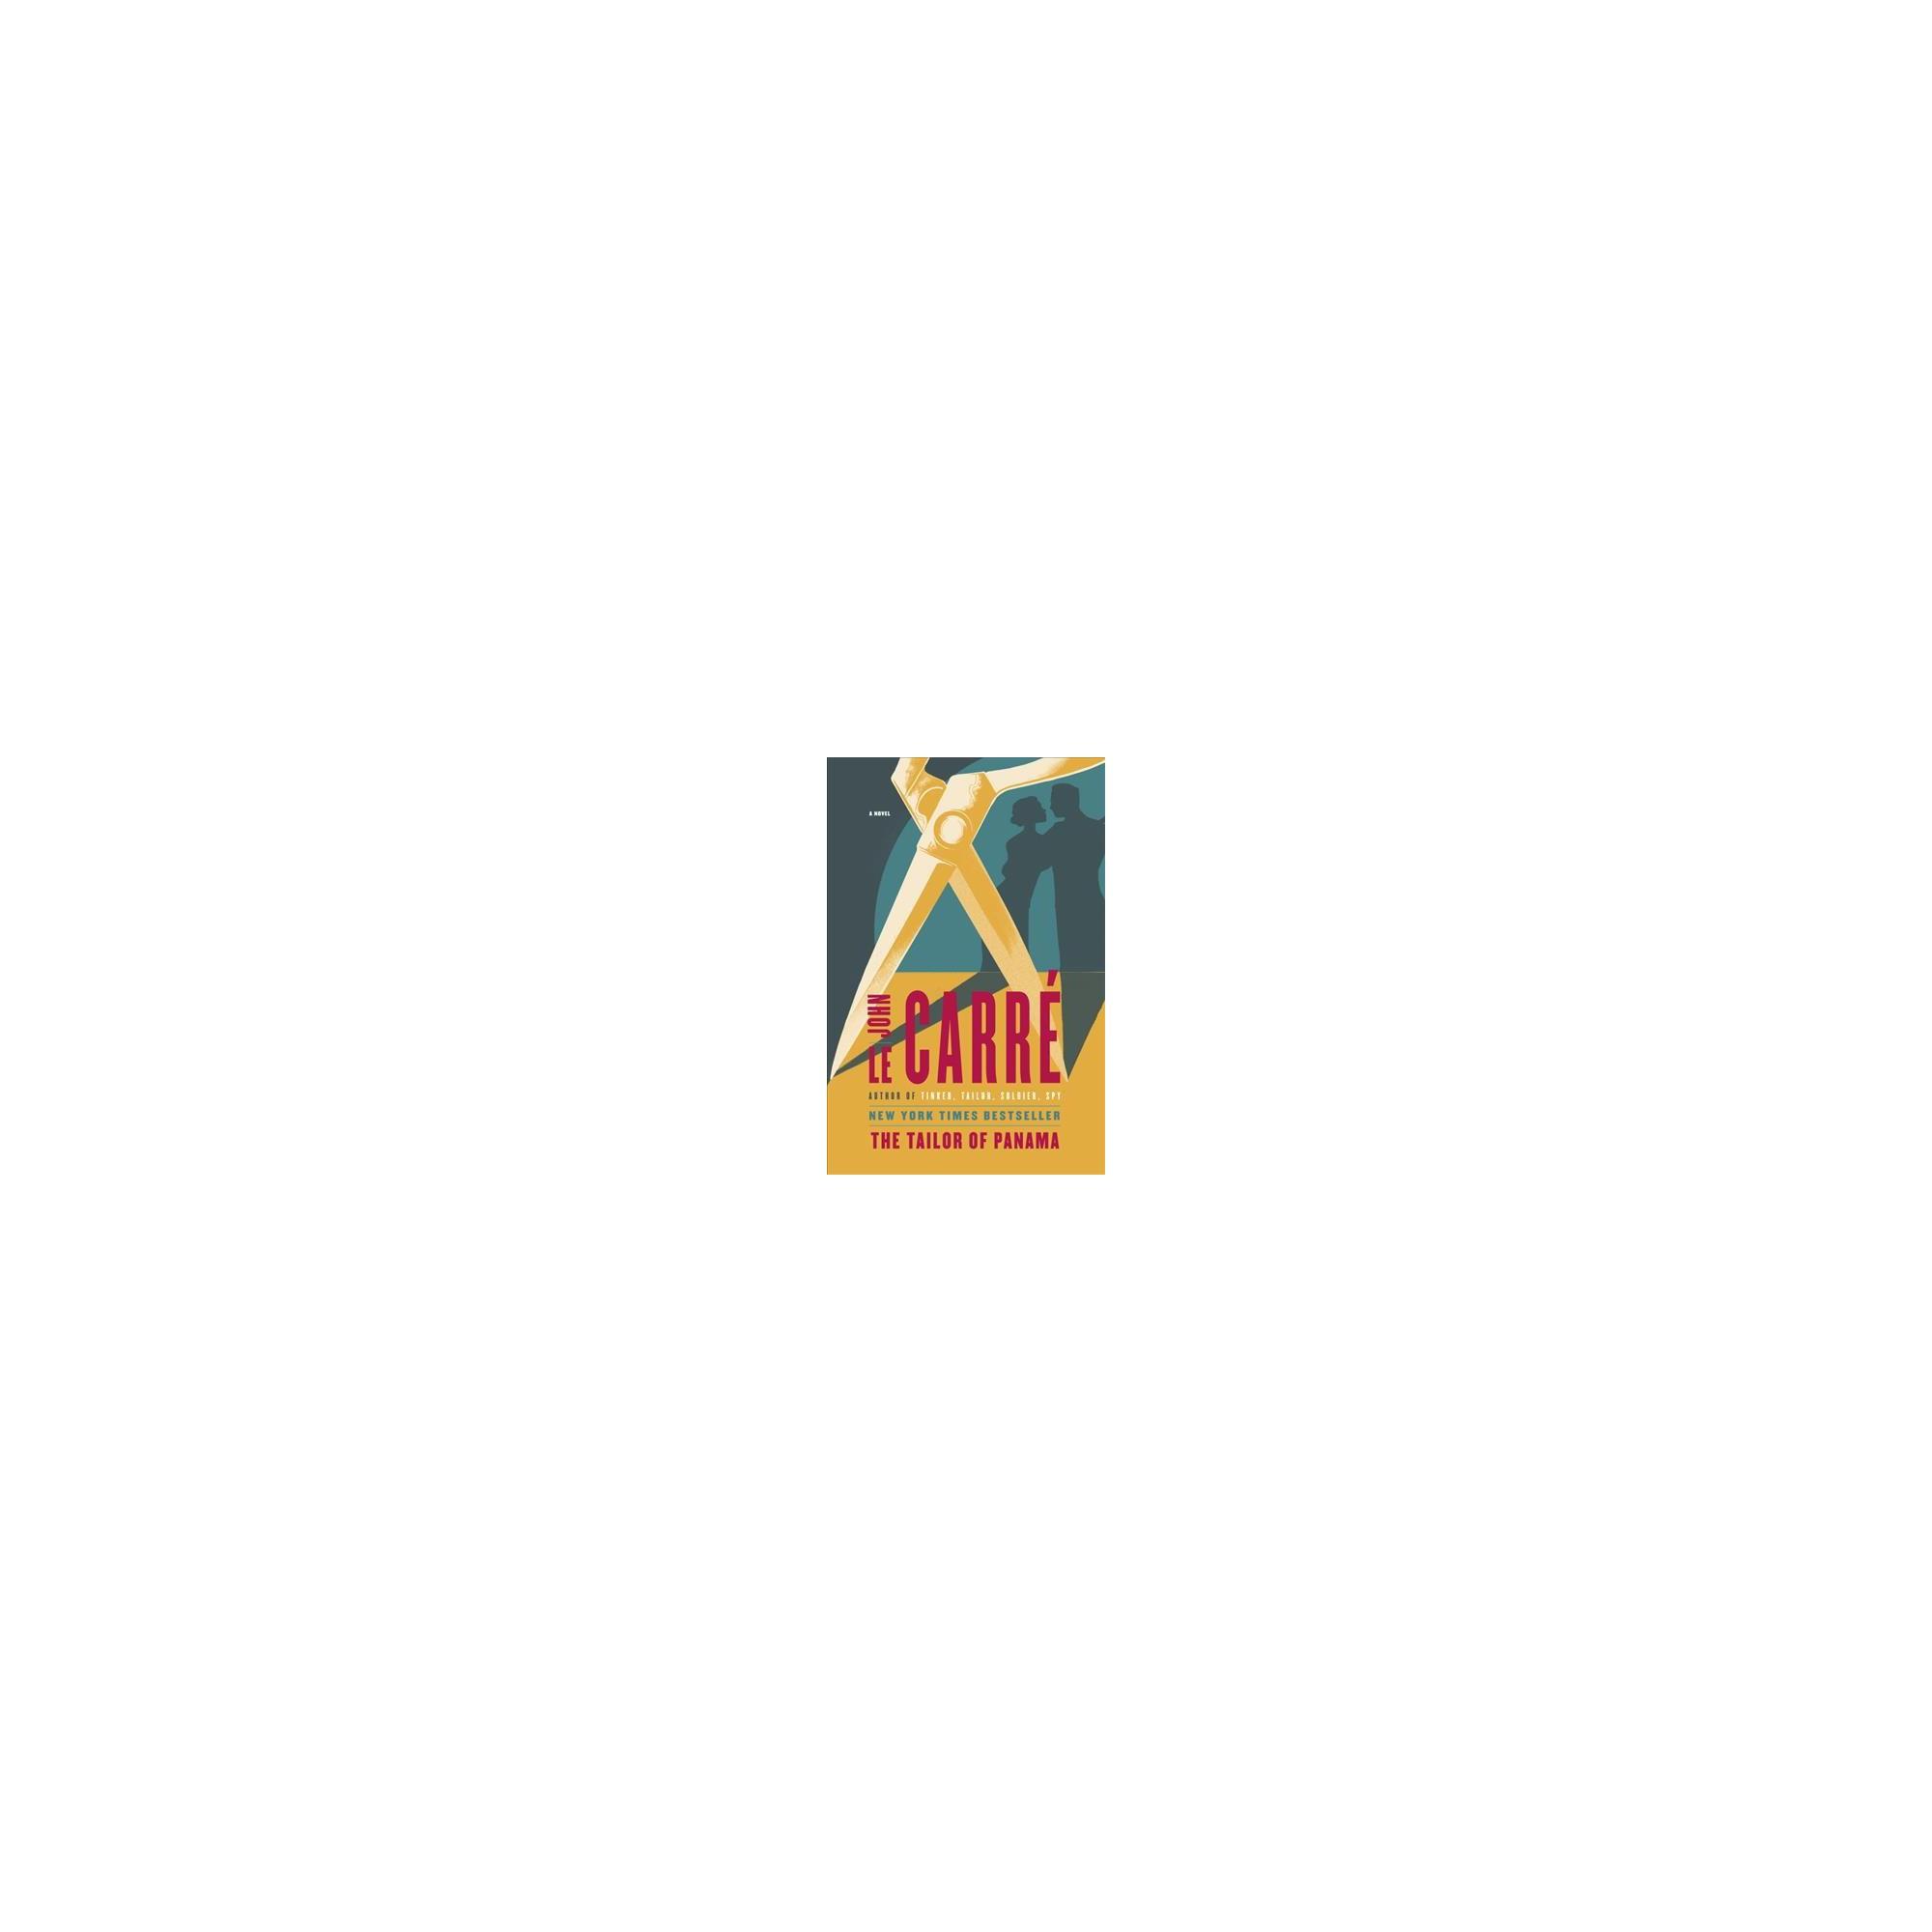 Küchenideen keine hängeschränke tailor of panama reprint paperback john le carre  products